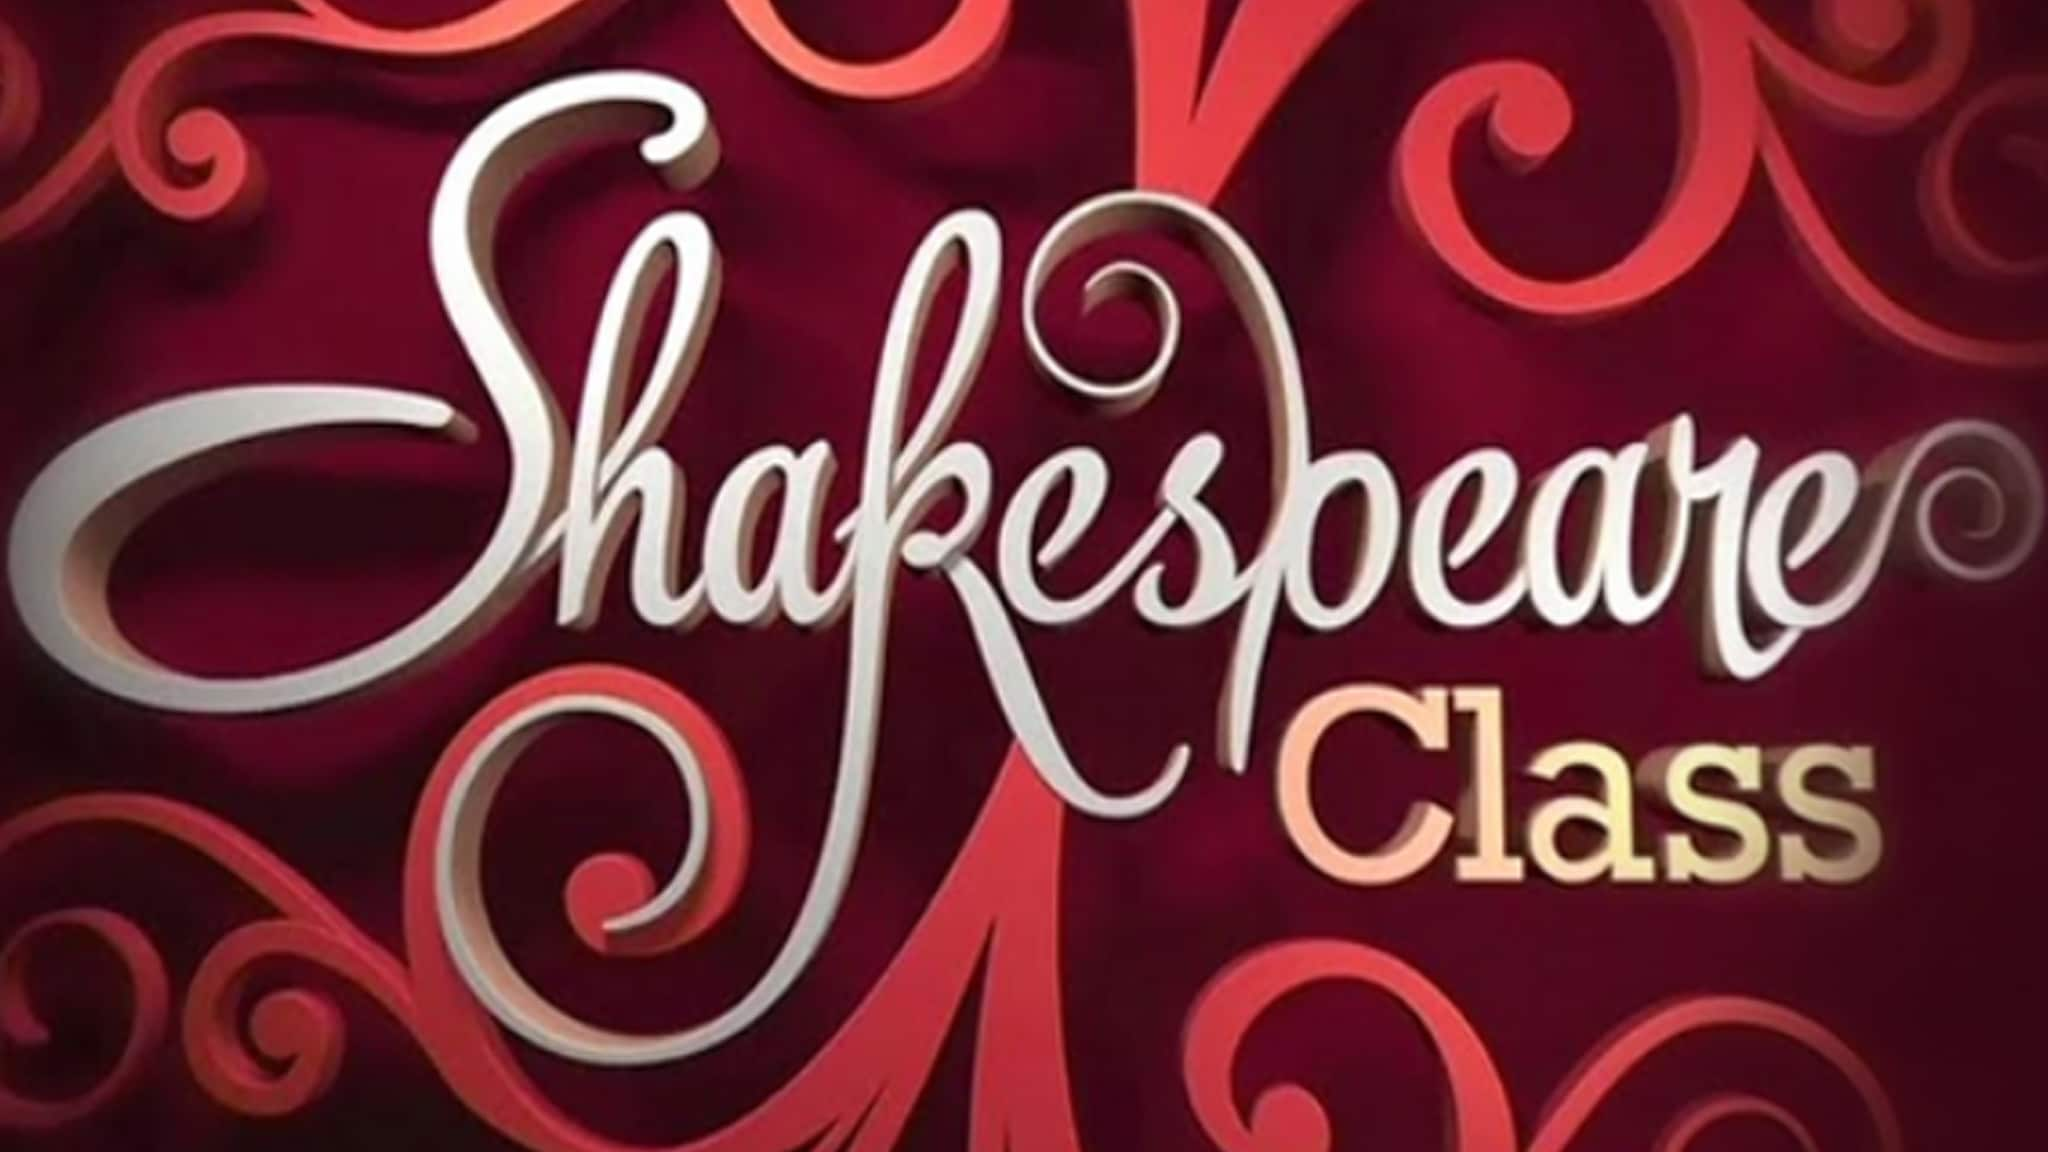 Rai Scuola Inglese Shakespeare class - A Midsummer Night's Dream - Dramaturgy Replica